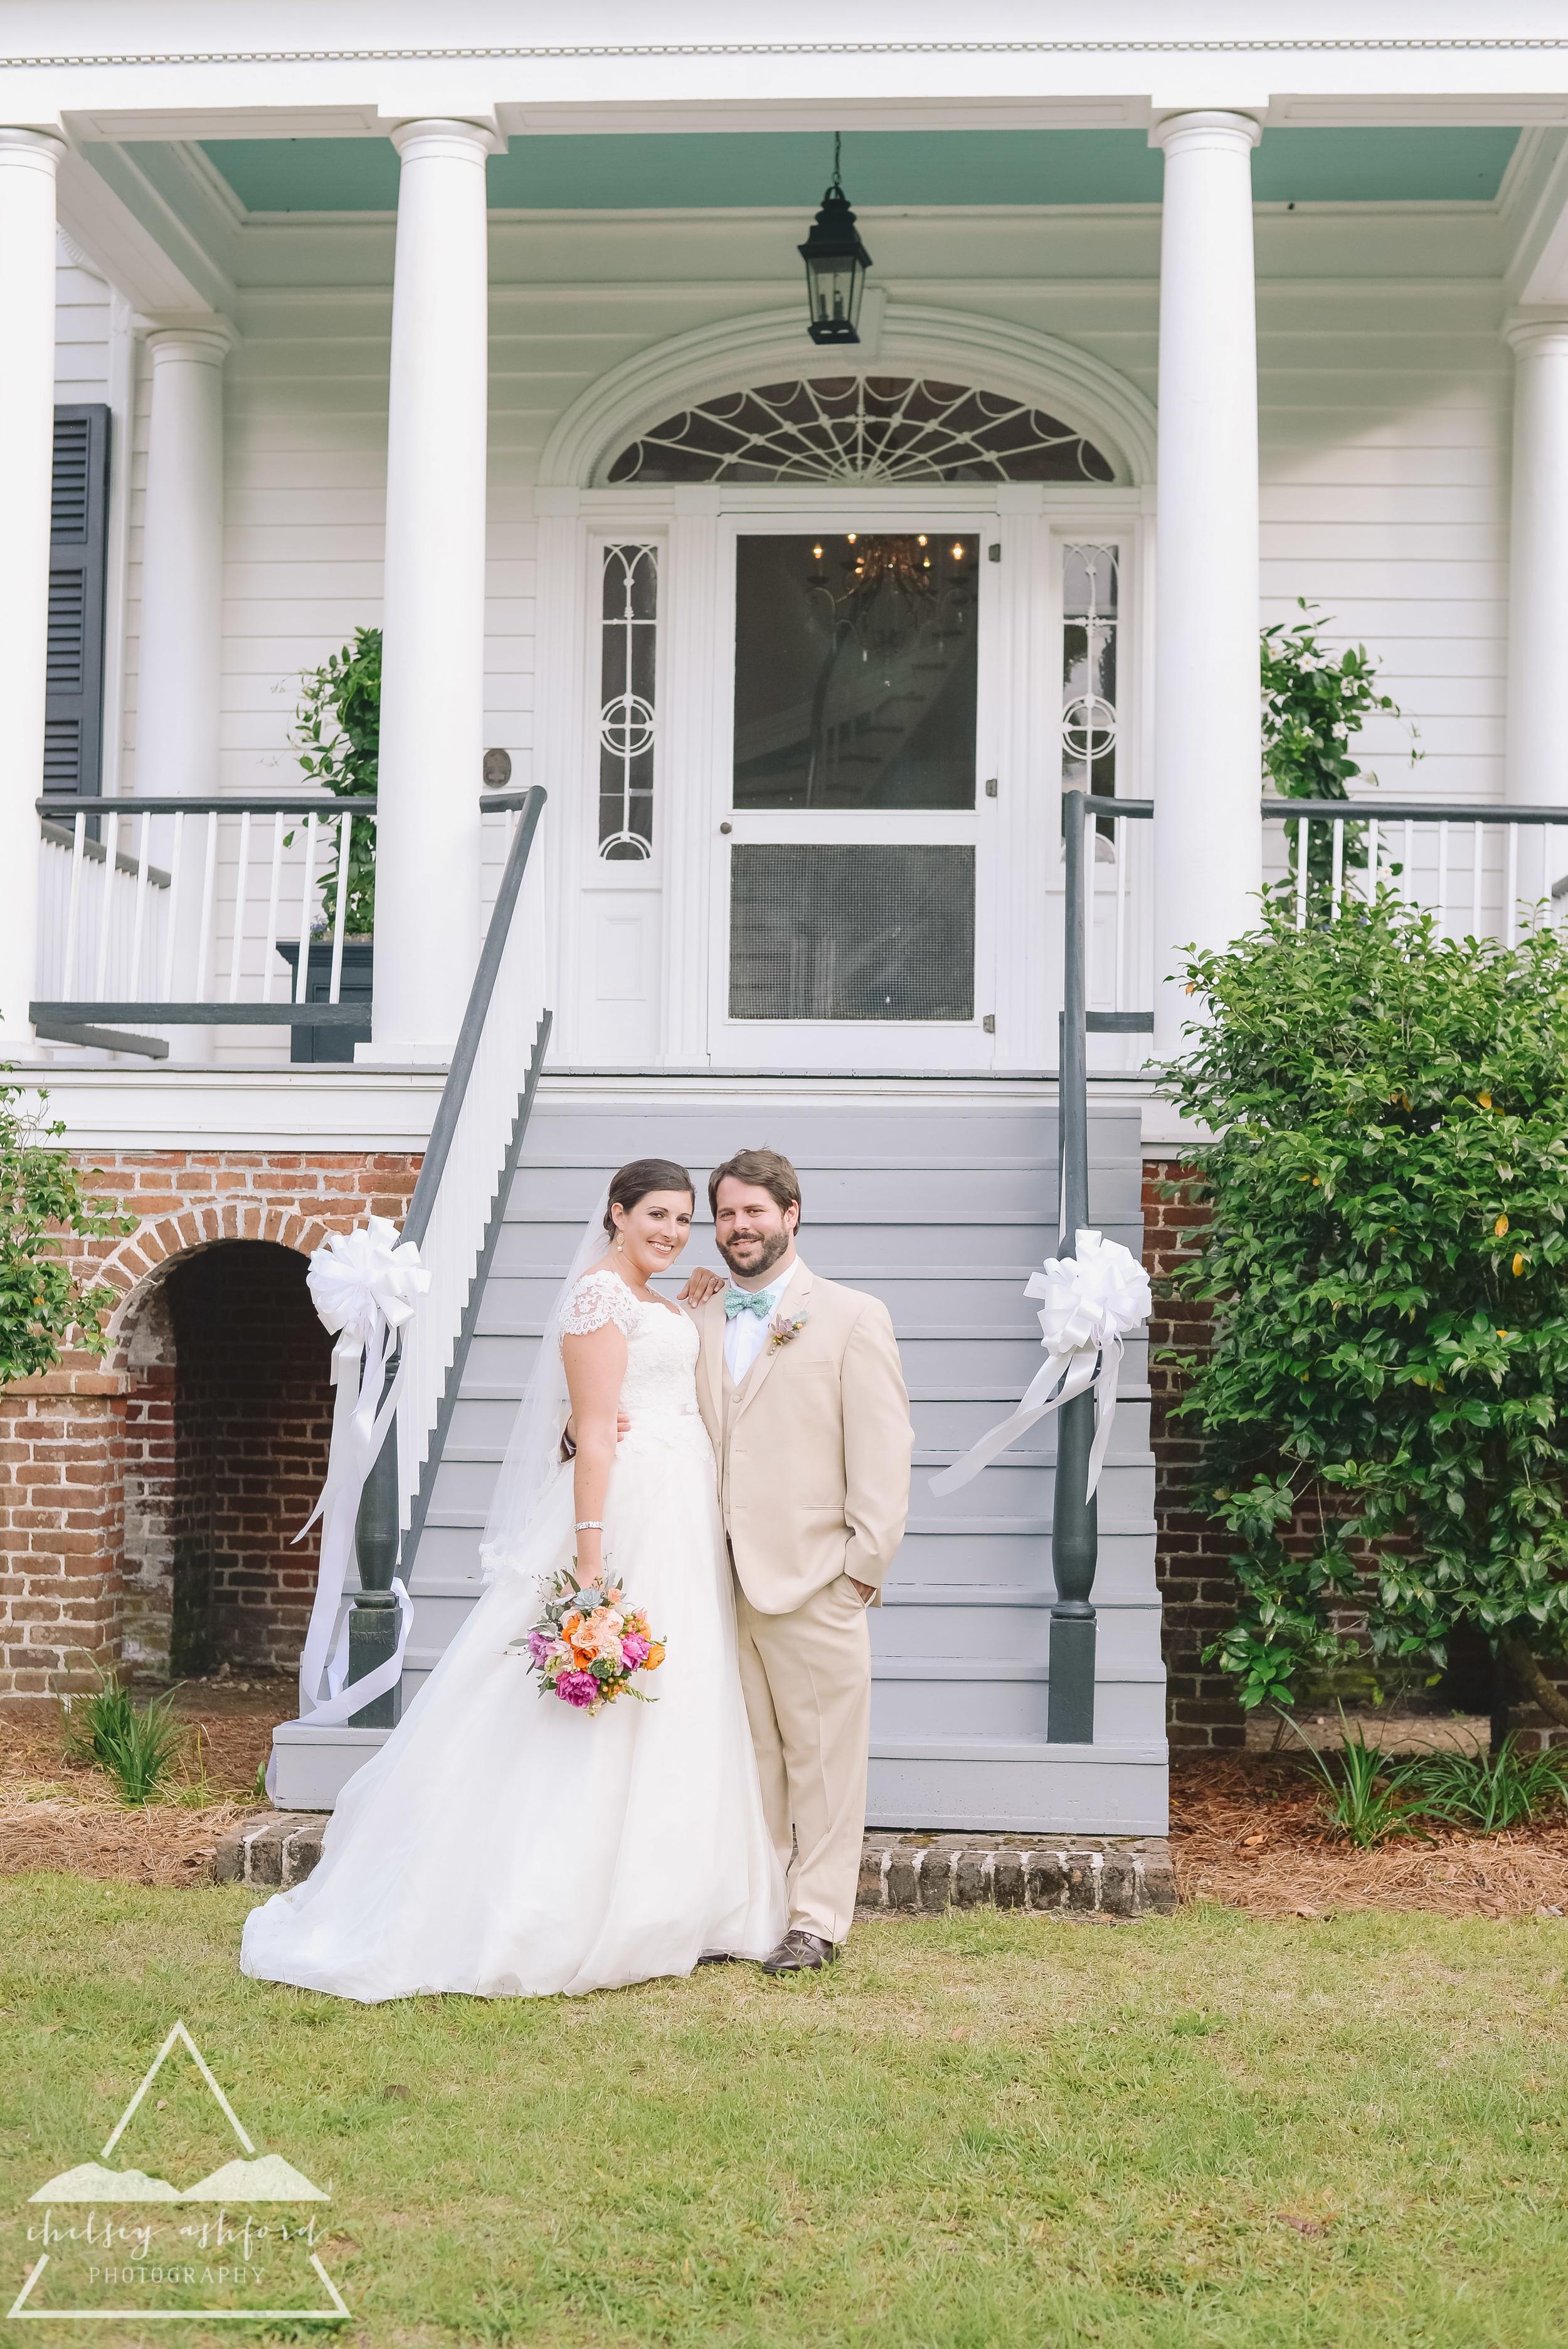 Clarkson_wedding_web-82.jpg